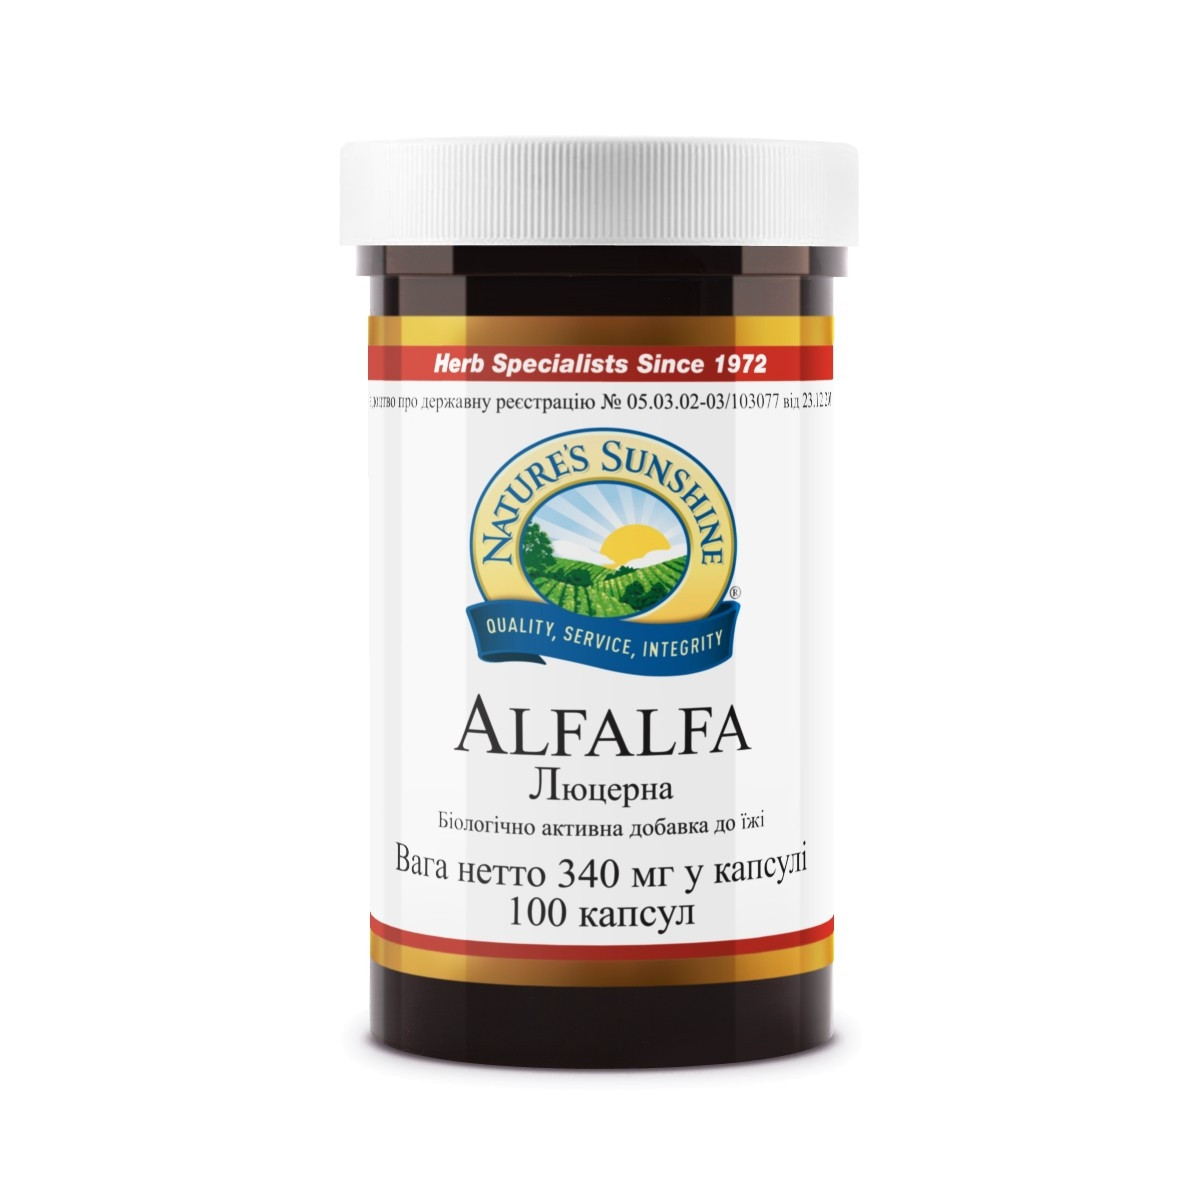 БАД при цукровому діабеті, лікування подгры - Альфа Альфа.